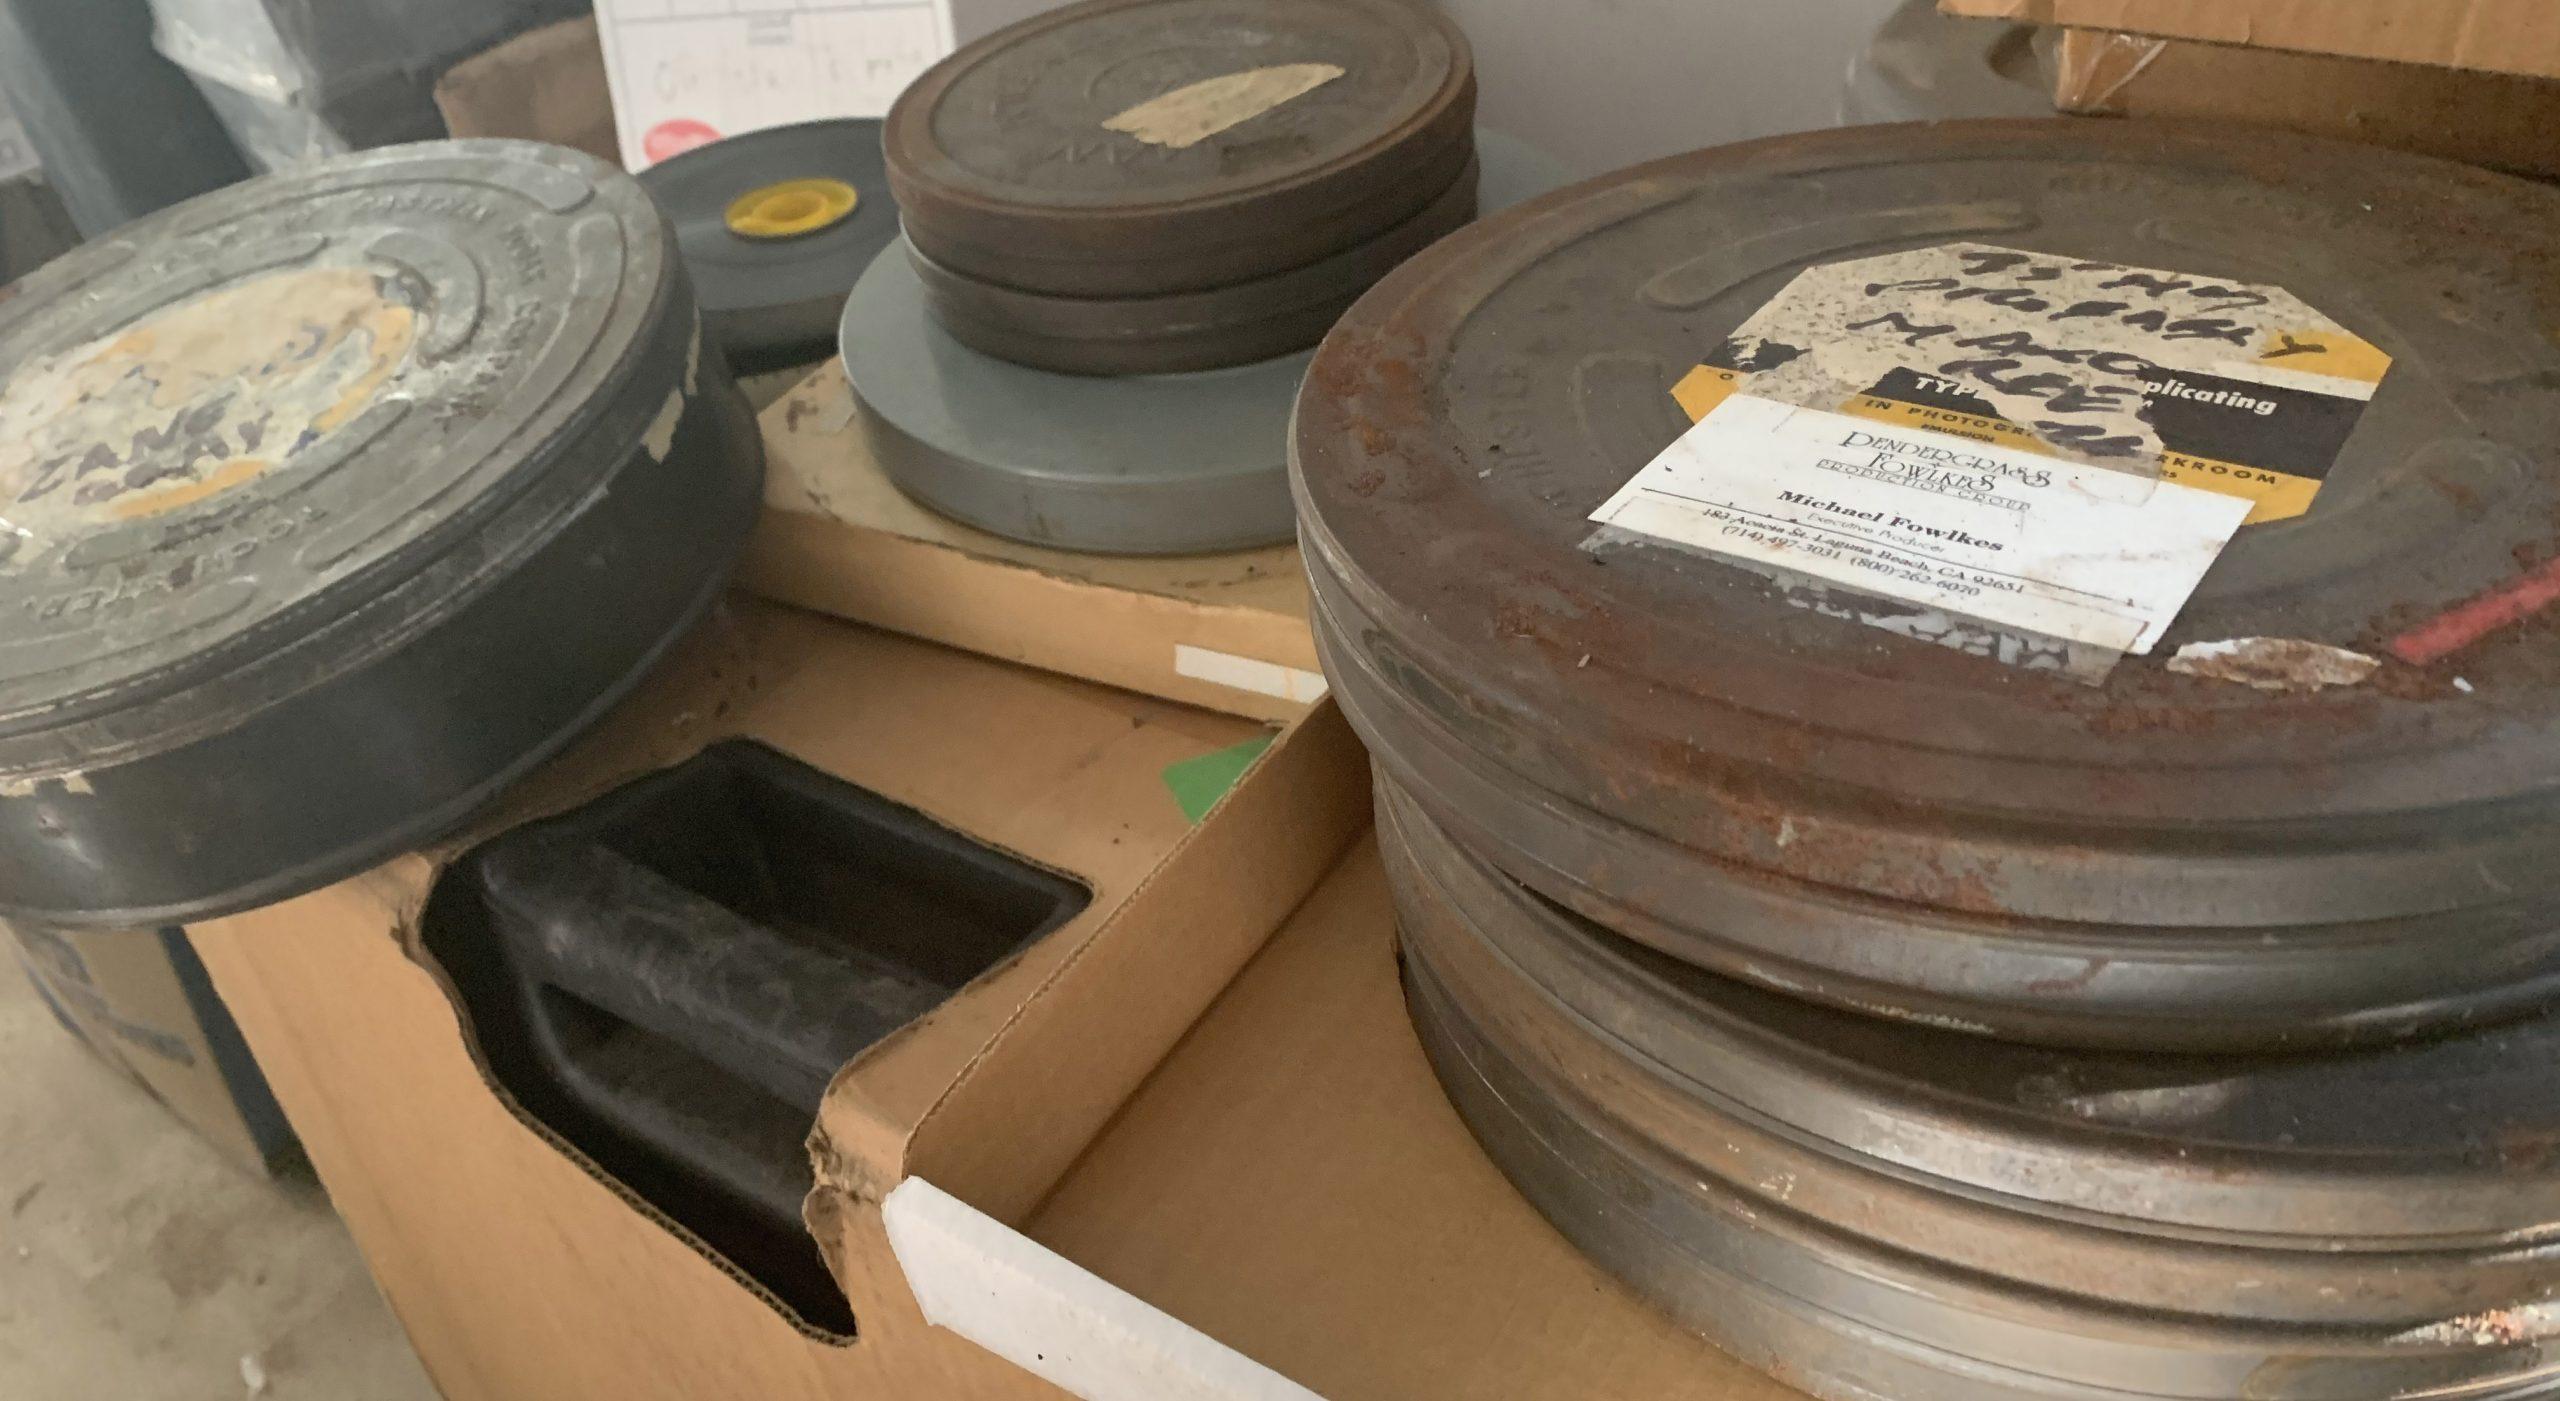 The_History_Of_Sportfishing_Old_Reels_Film-Preservation_2